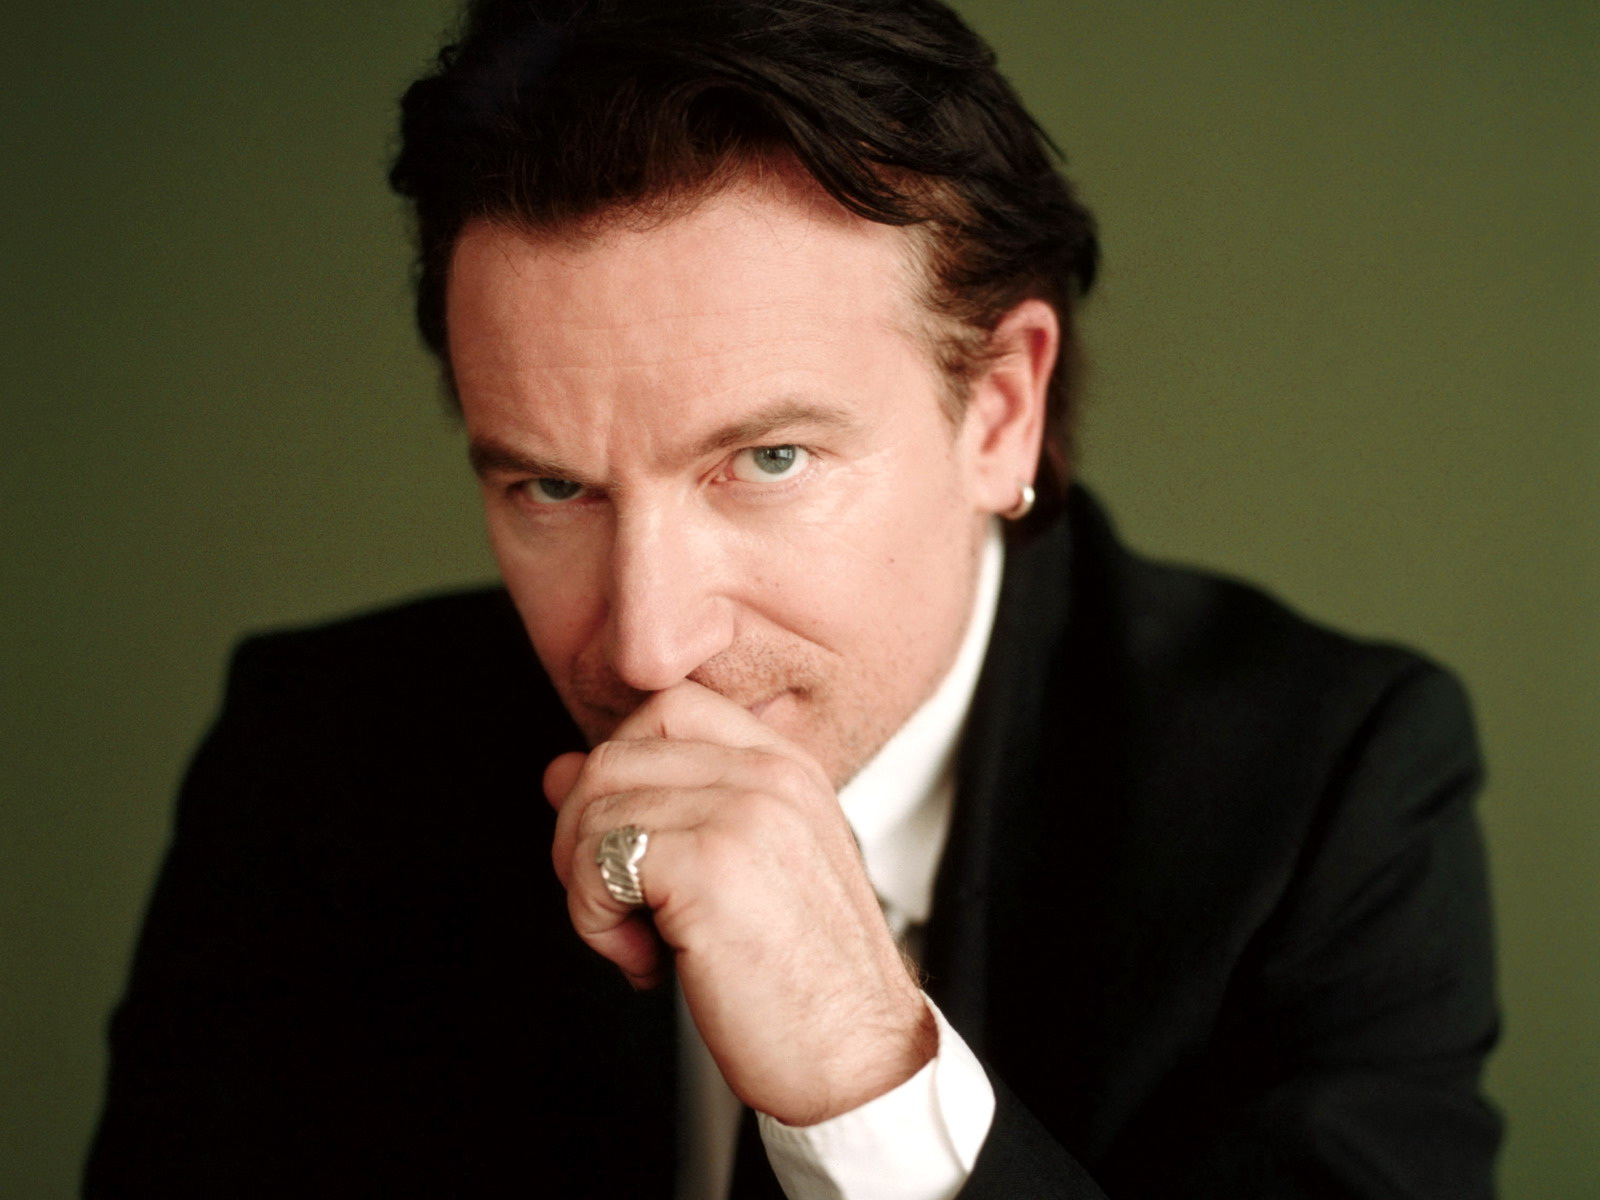 bono guys Bono was born paul david hewson in dublin, ireland on may 10, 1960, to iris (rankin) and brendan robert hewson he has been the lead singer of.